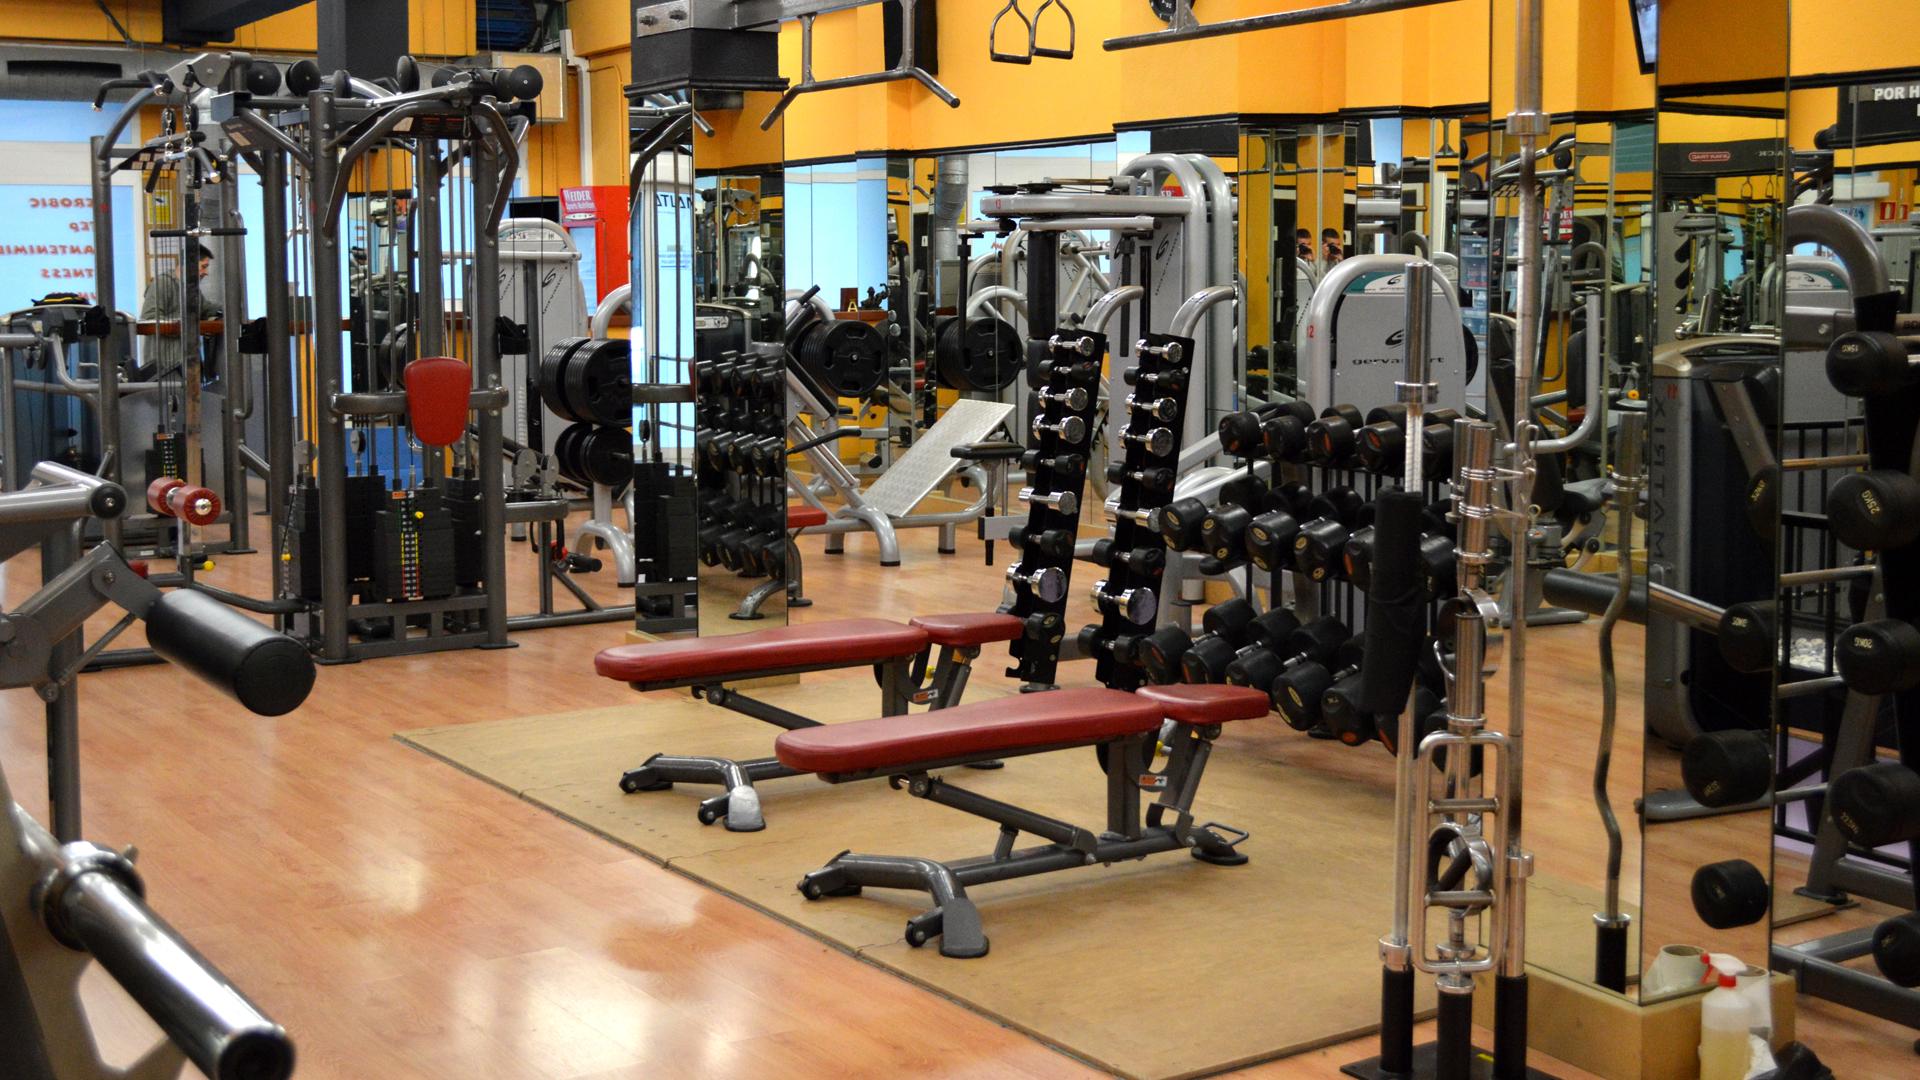 Gym atlanta studio gimnasio palma de mallorca for Gimnasio gimnasio